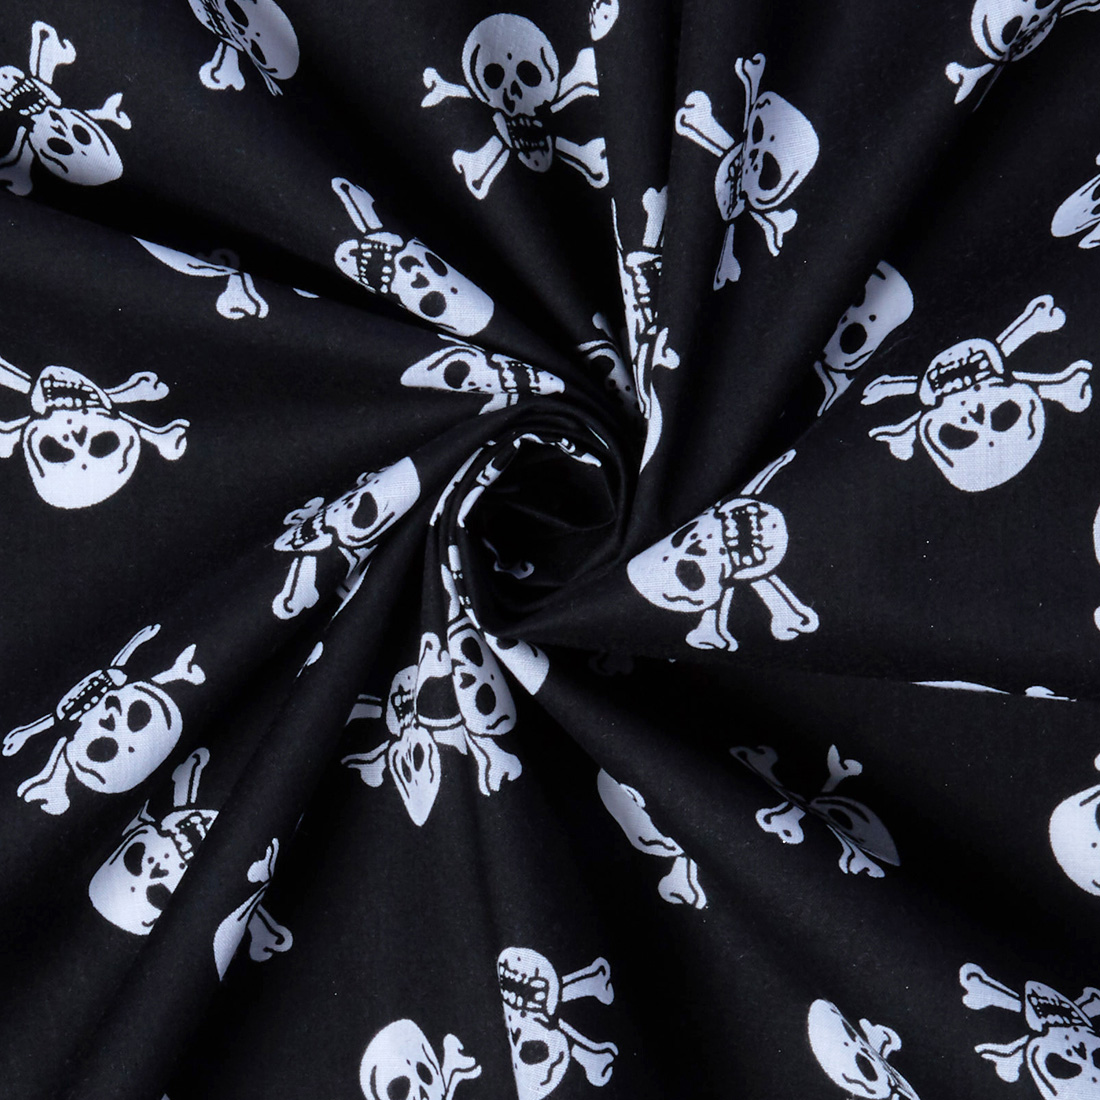 Polycotton Skulls Print White Black